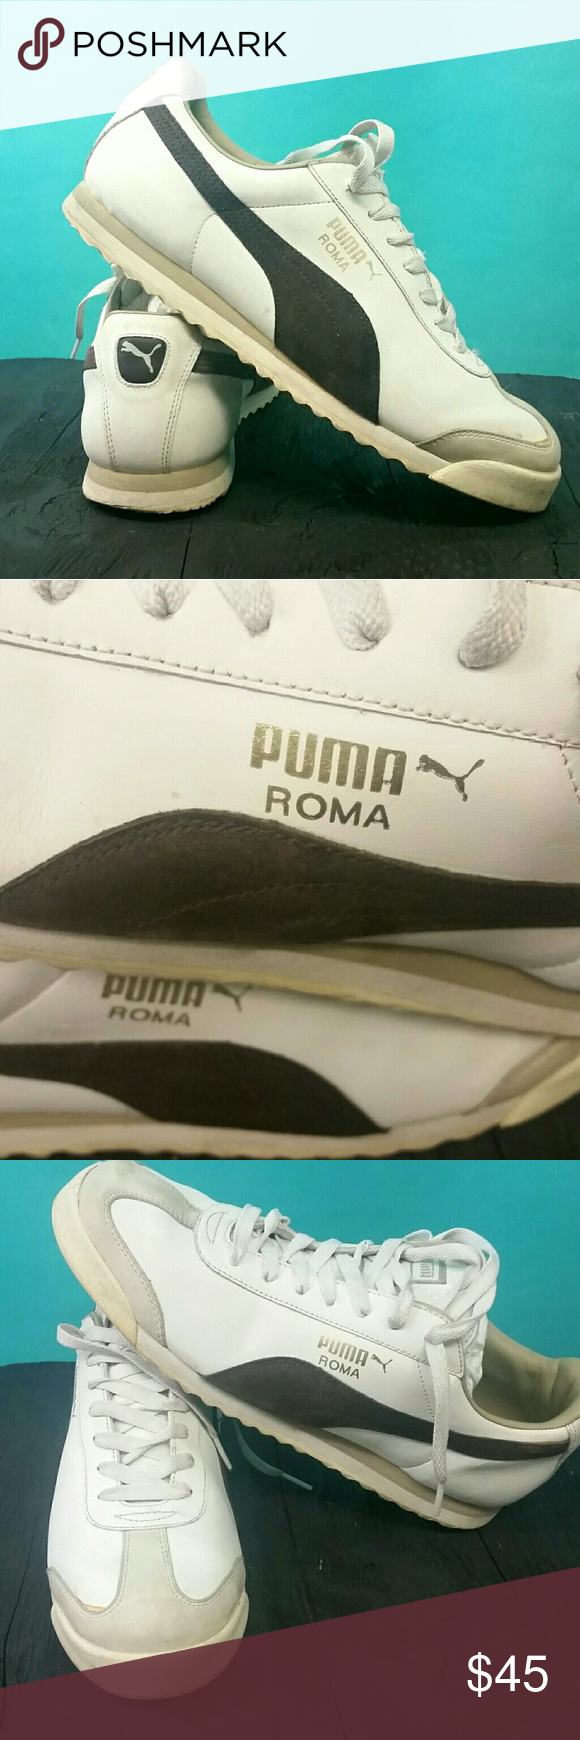 PUMA ROMA size 10 White \u0026 Brown used